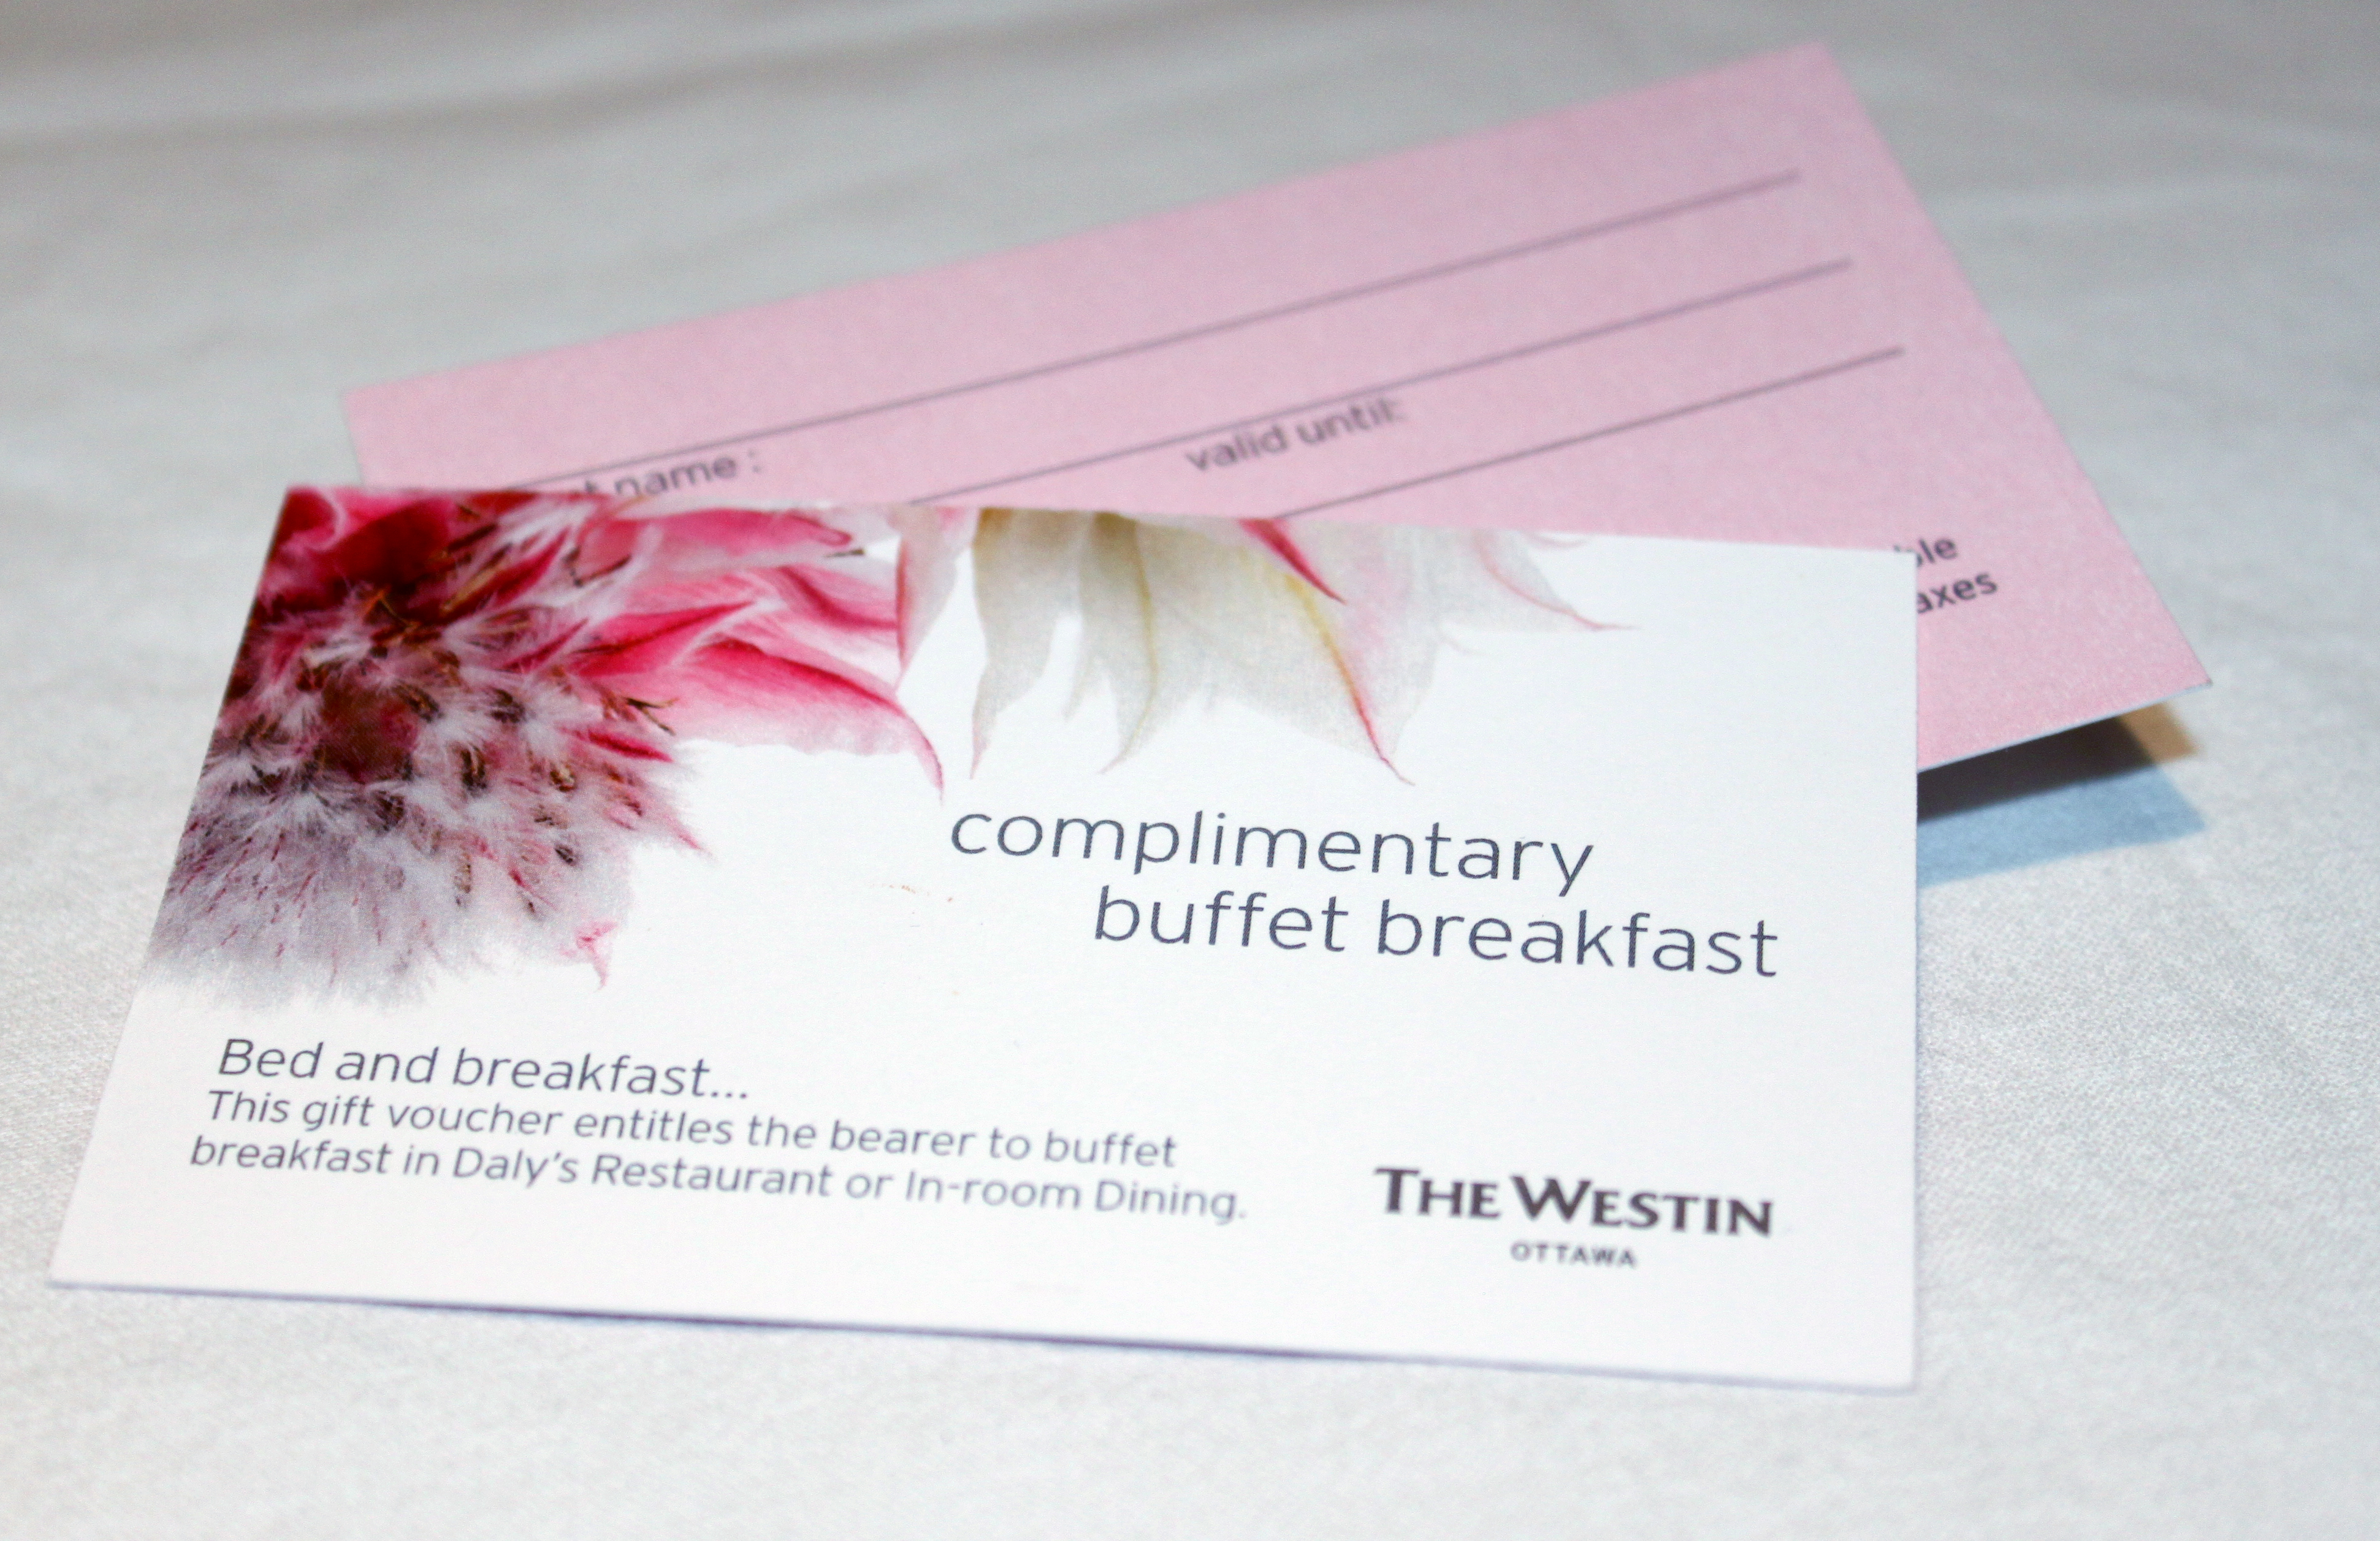 The Westin Hotel